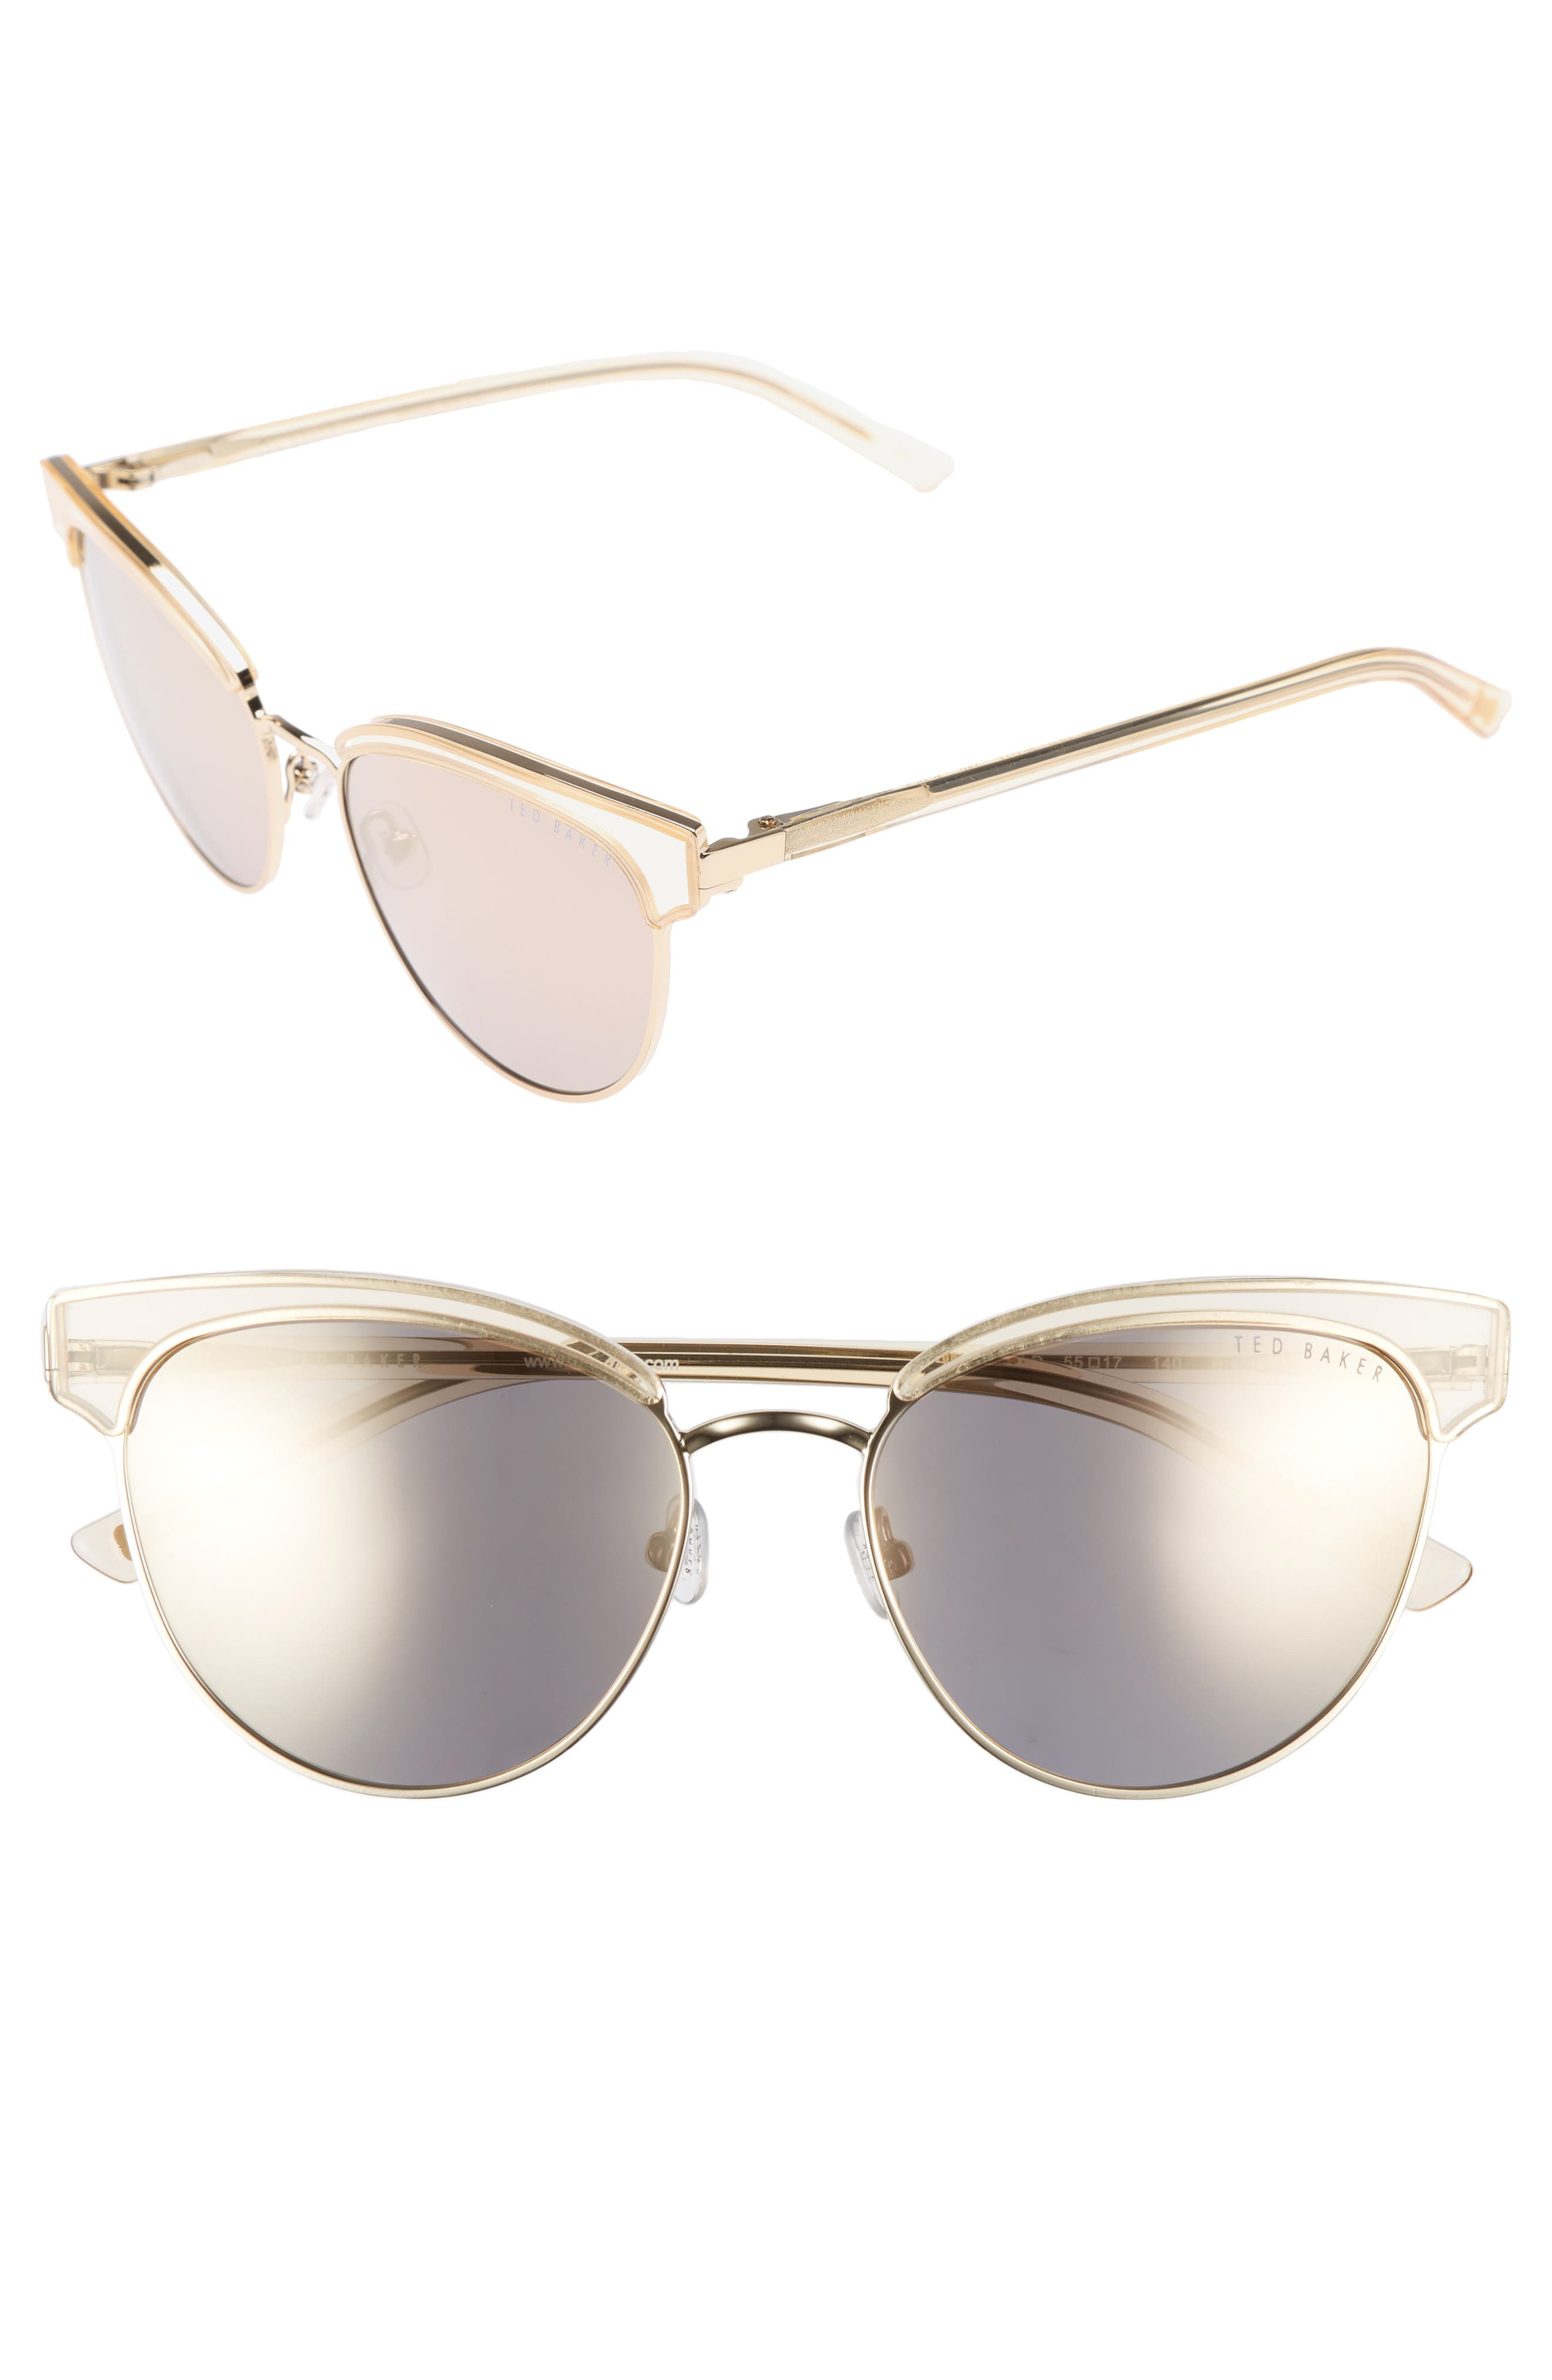 Ted Baker London 55mm Mirrored Semi Rimless Cat Eye Sunglasses